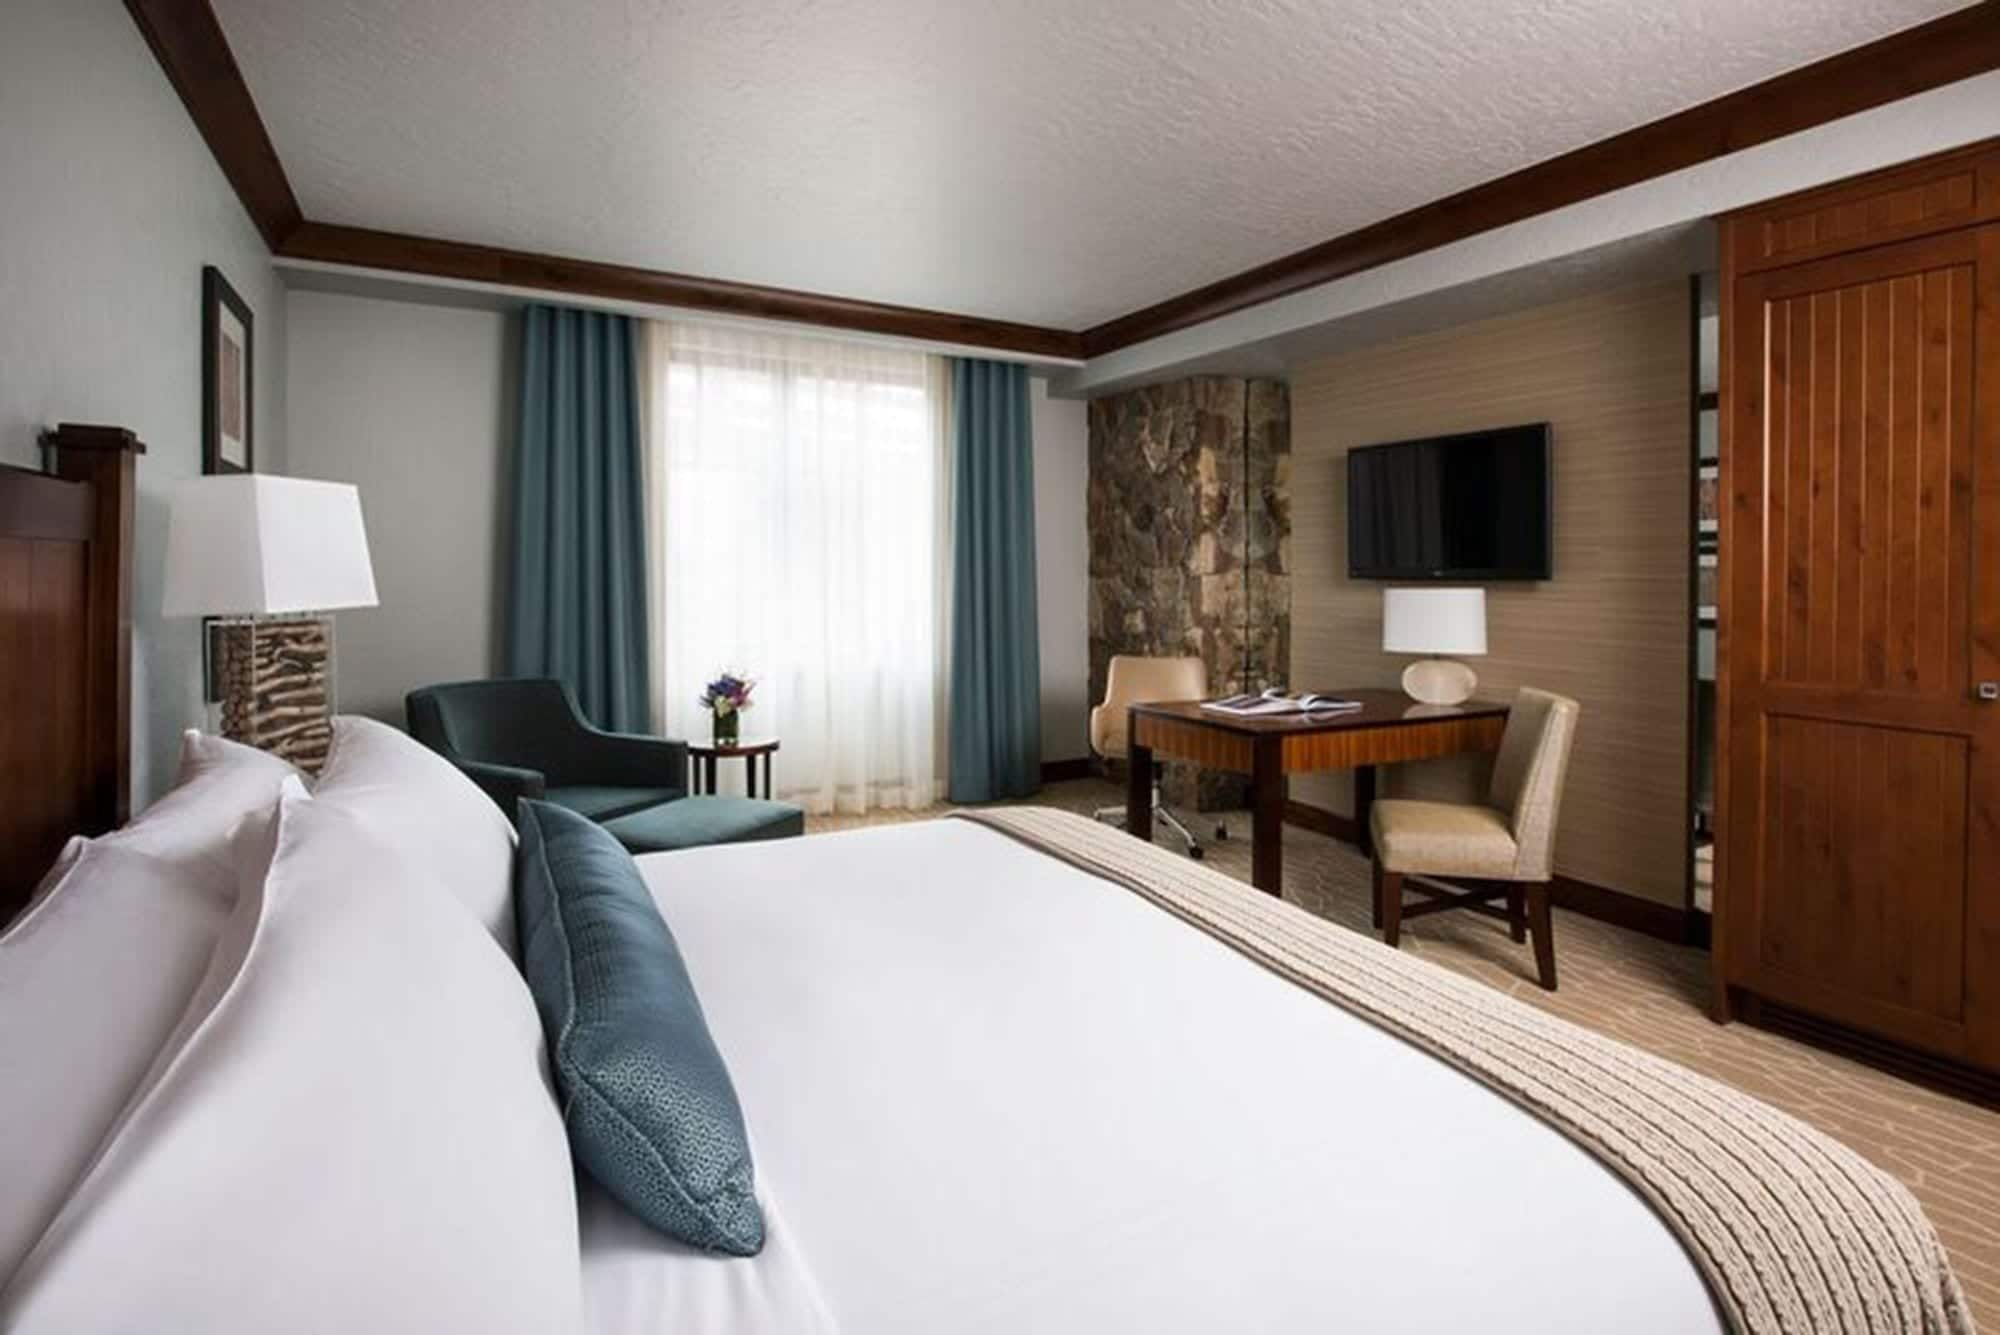 Room at The Ritz-Carlton, Bachelor Gulch.